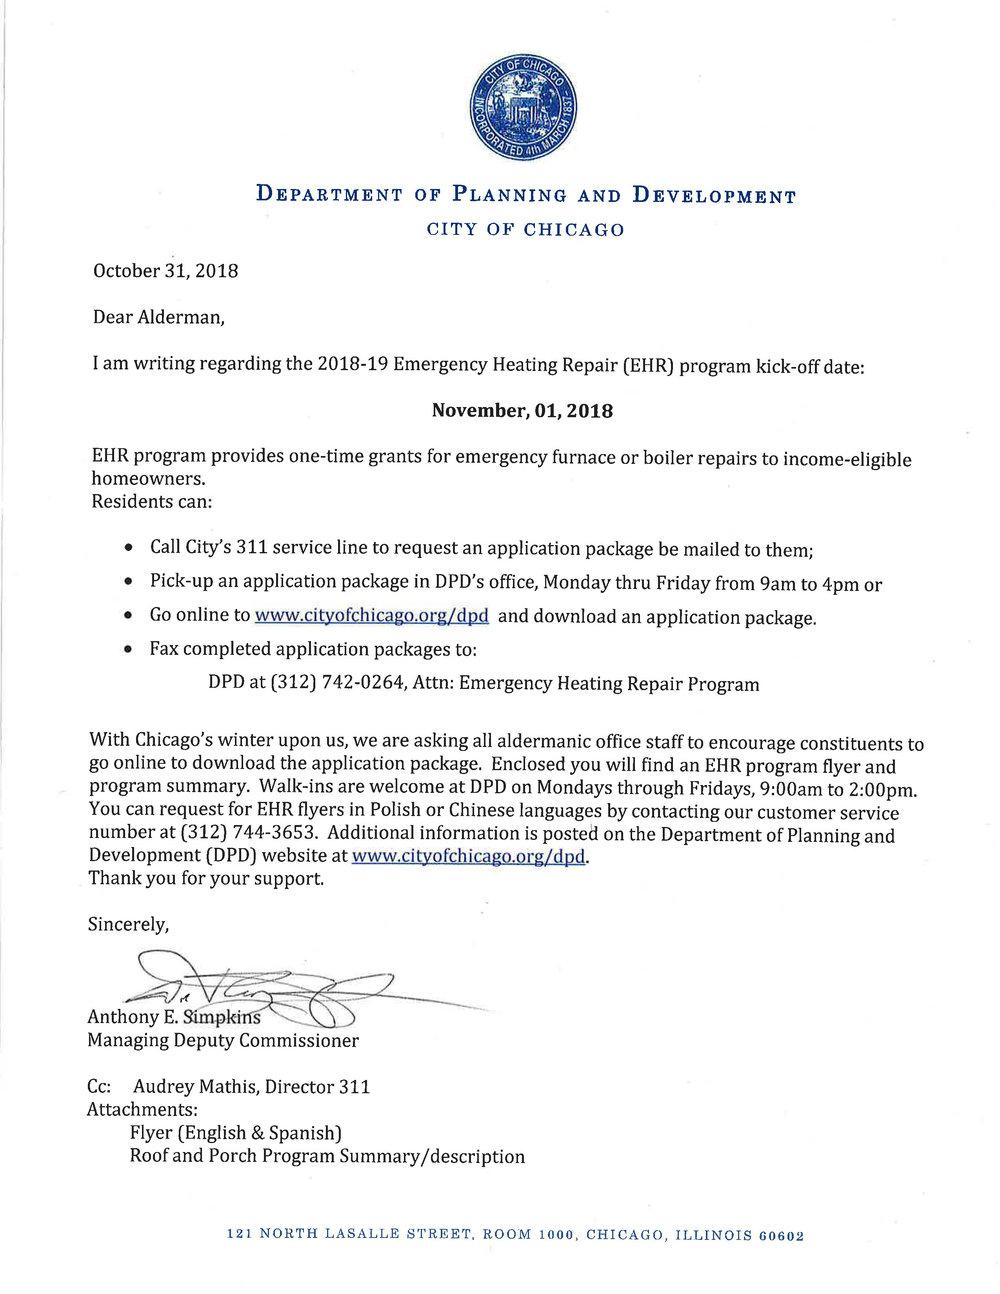 A Simpkins cover letter EHR 2018-19 program 11.01.18.jpg